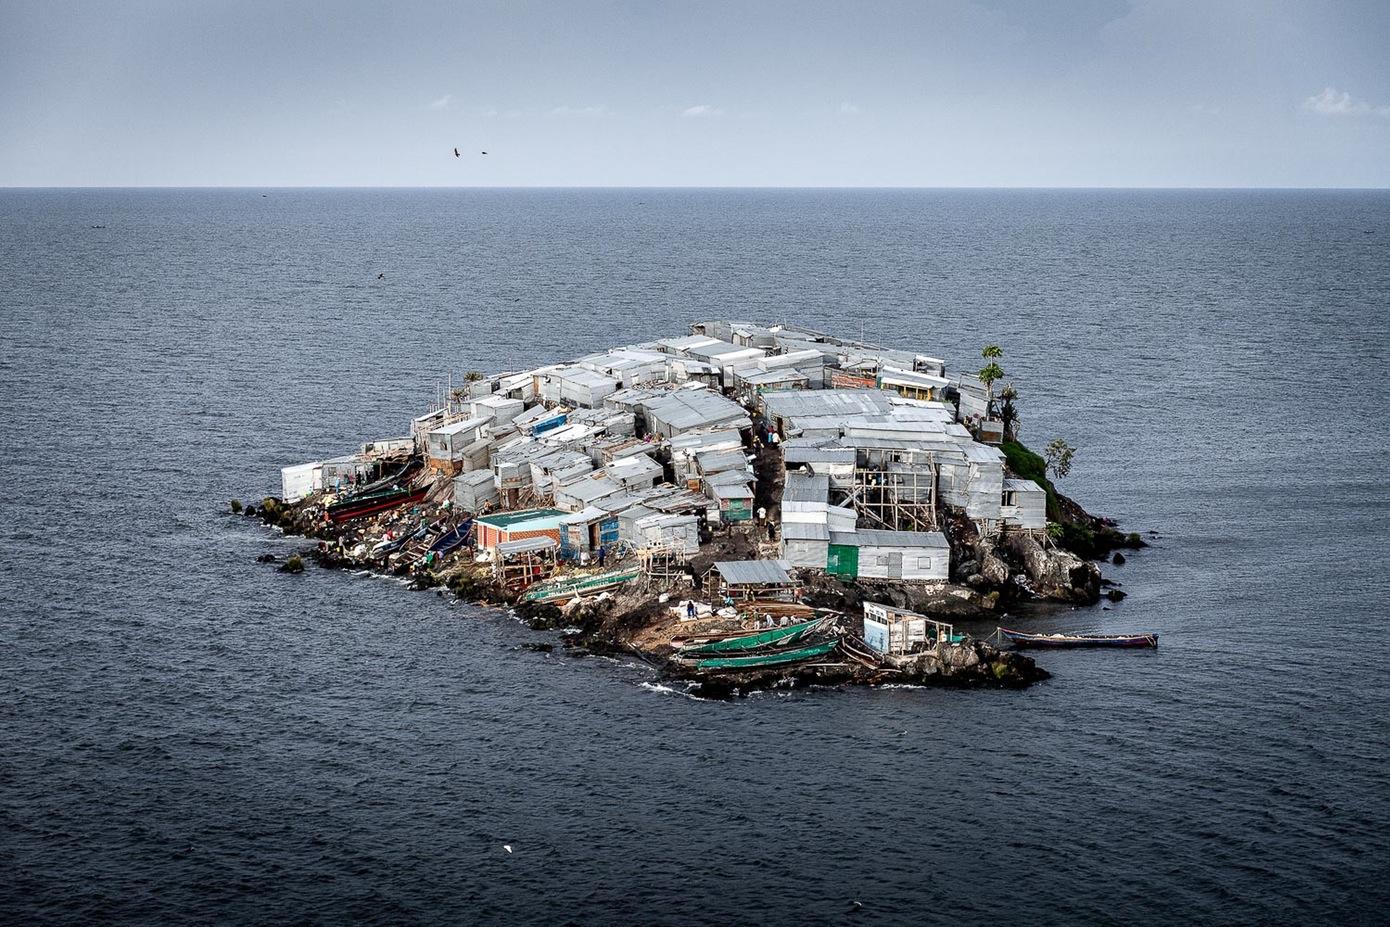 Остров Мигинго, или африканский теремок